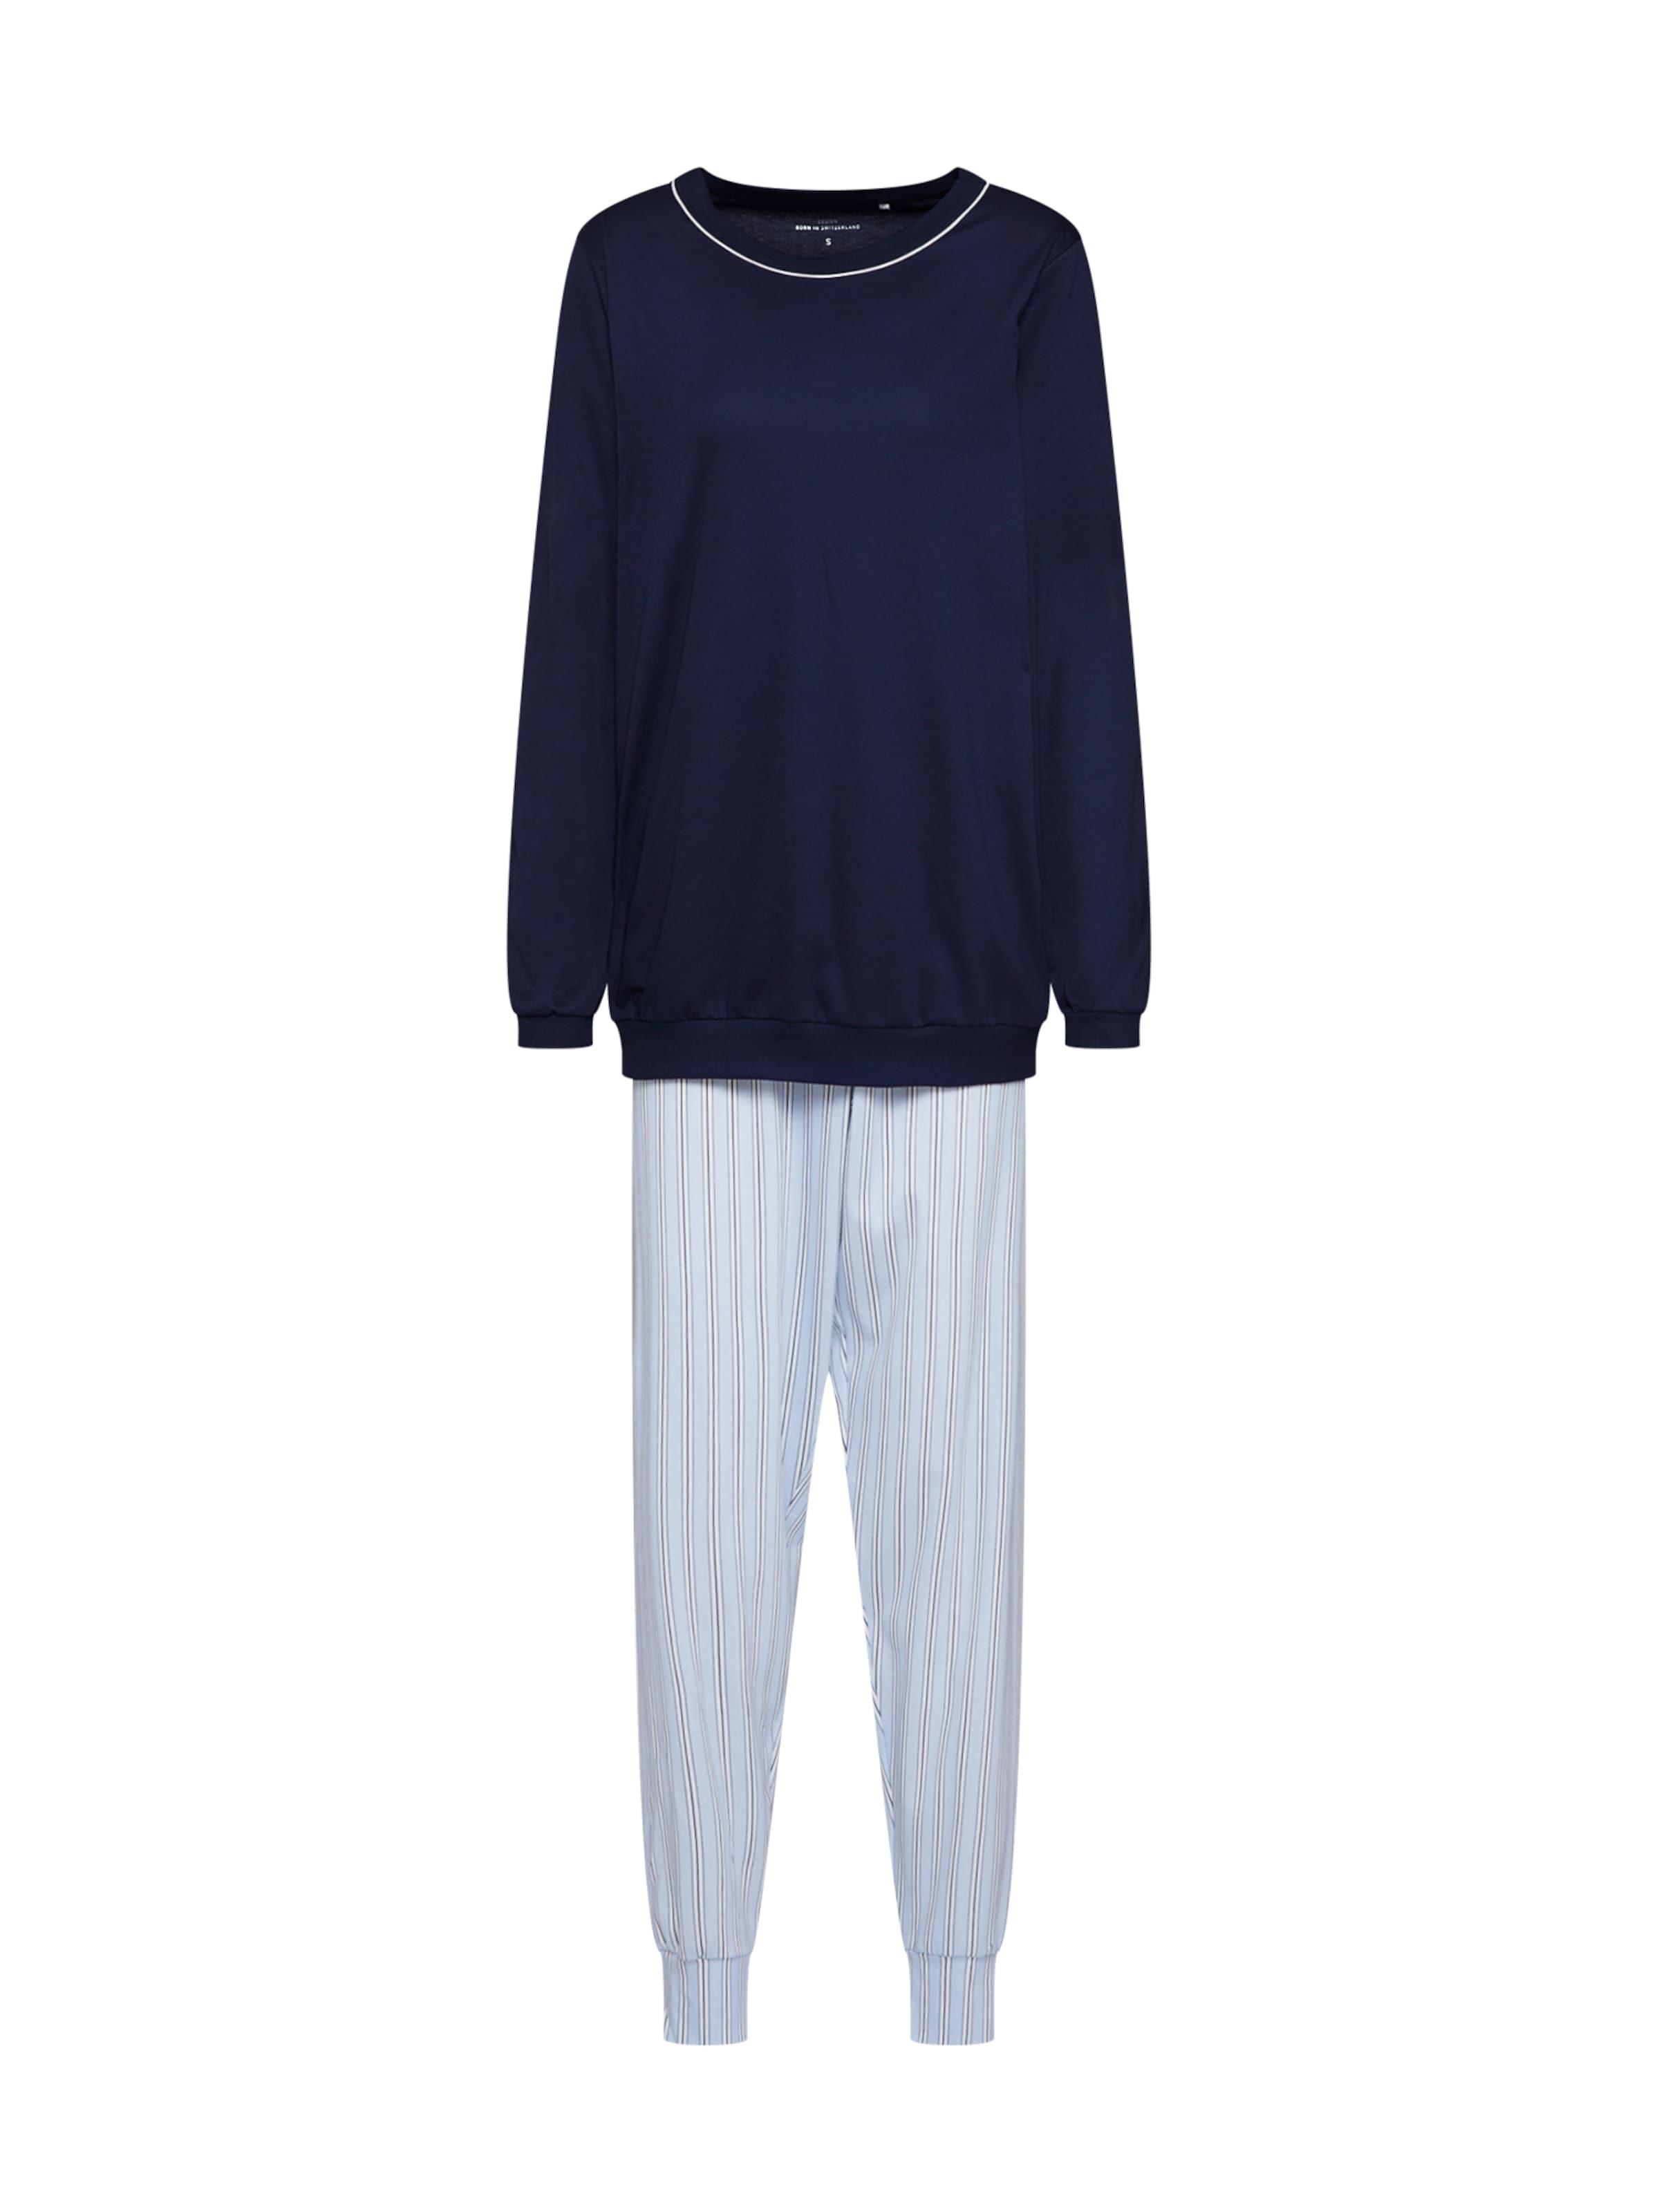 Calida En Pyjama Bleu Calida Pyjama En 8nw0OPk